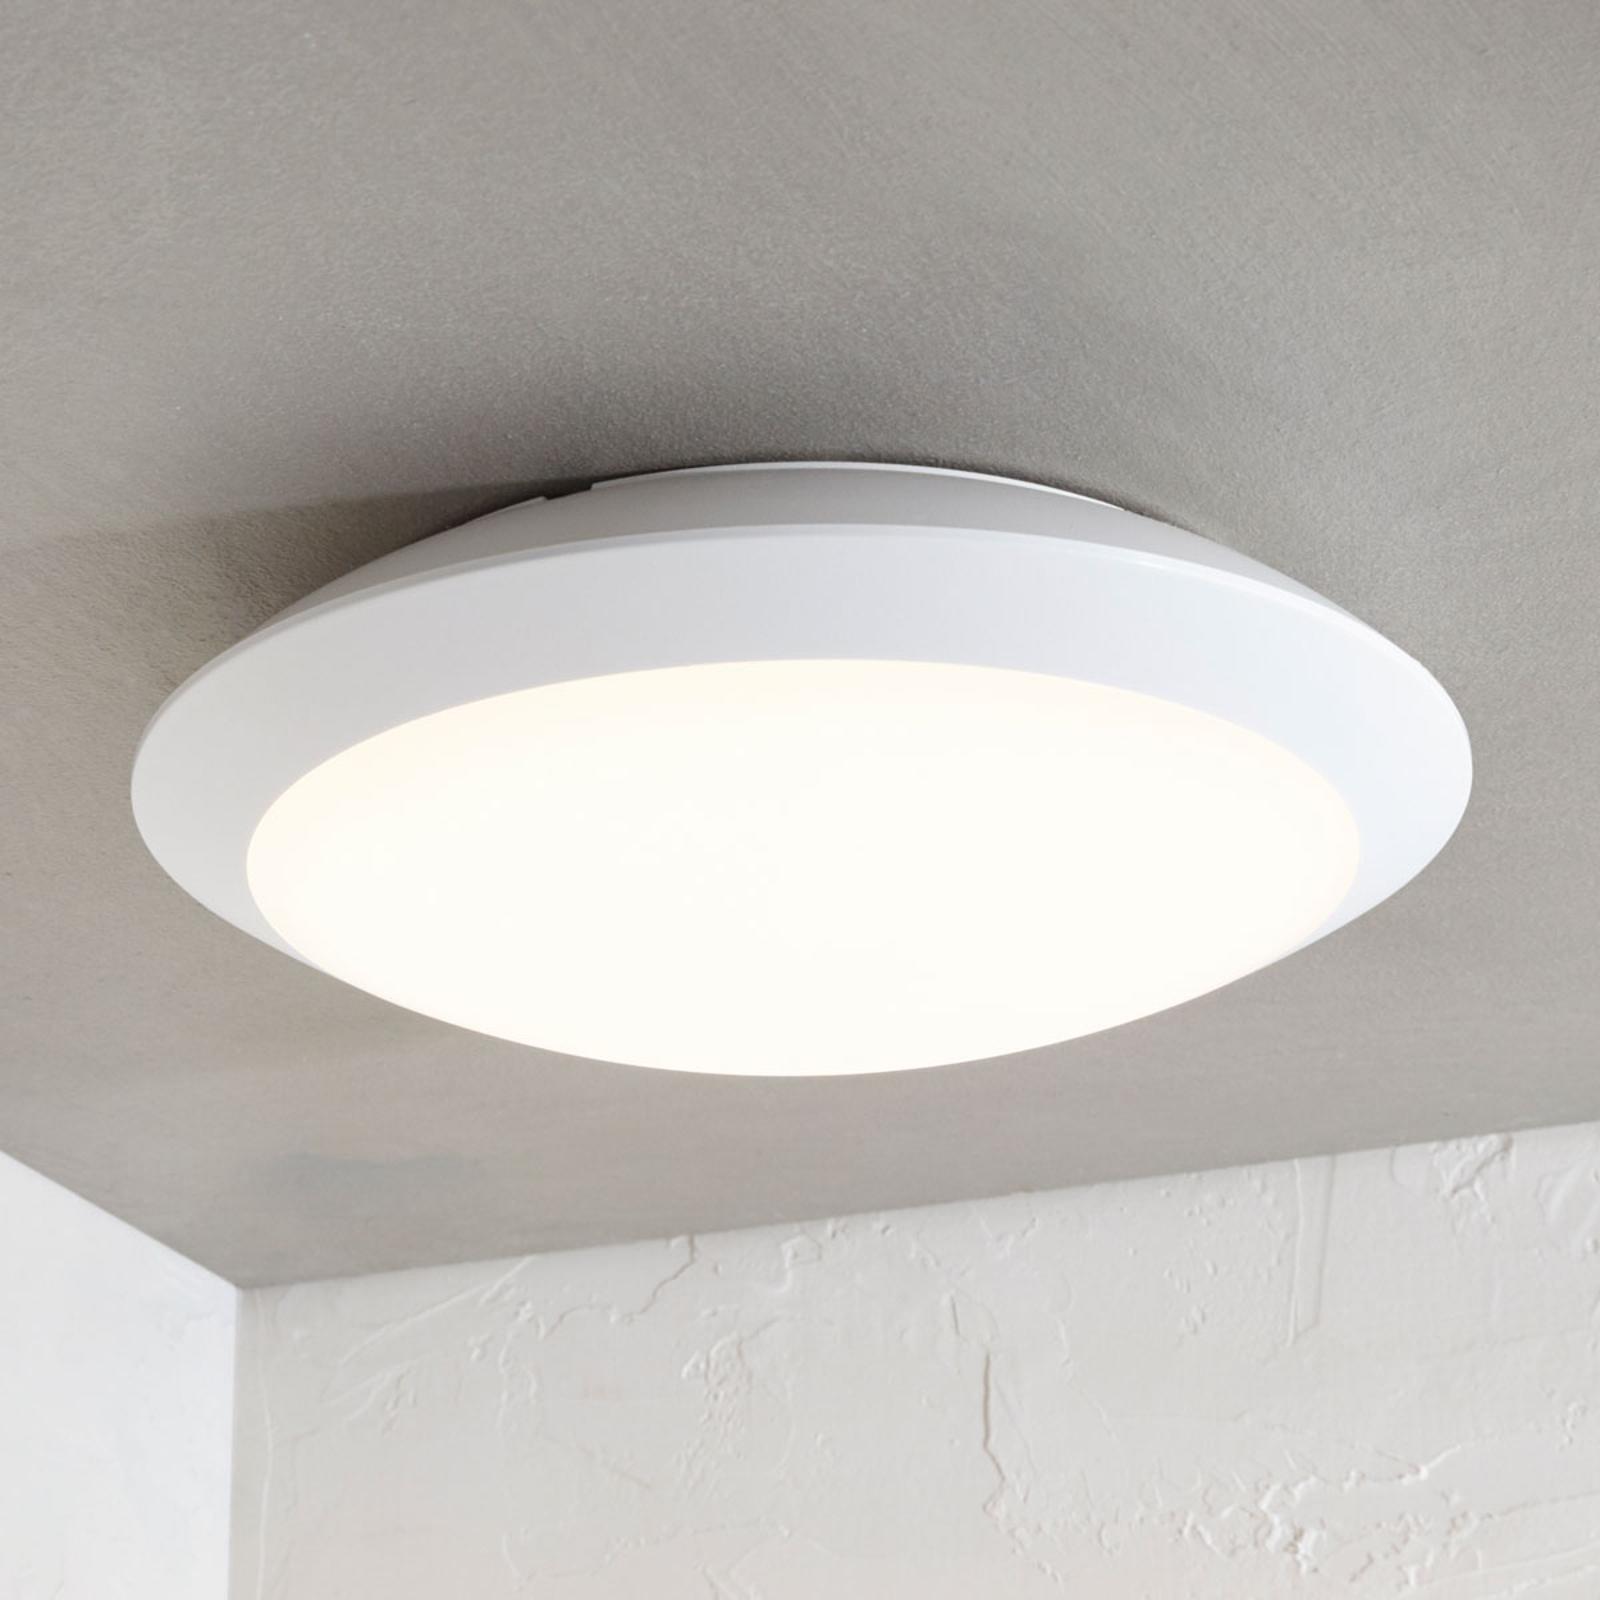 Lampa sufitowa LED Naira biała, bez czujnika